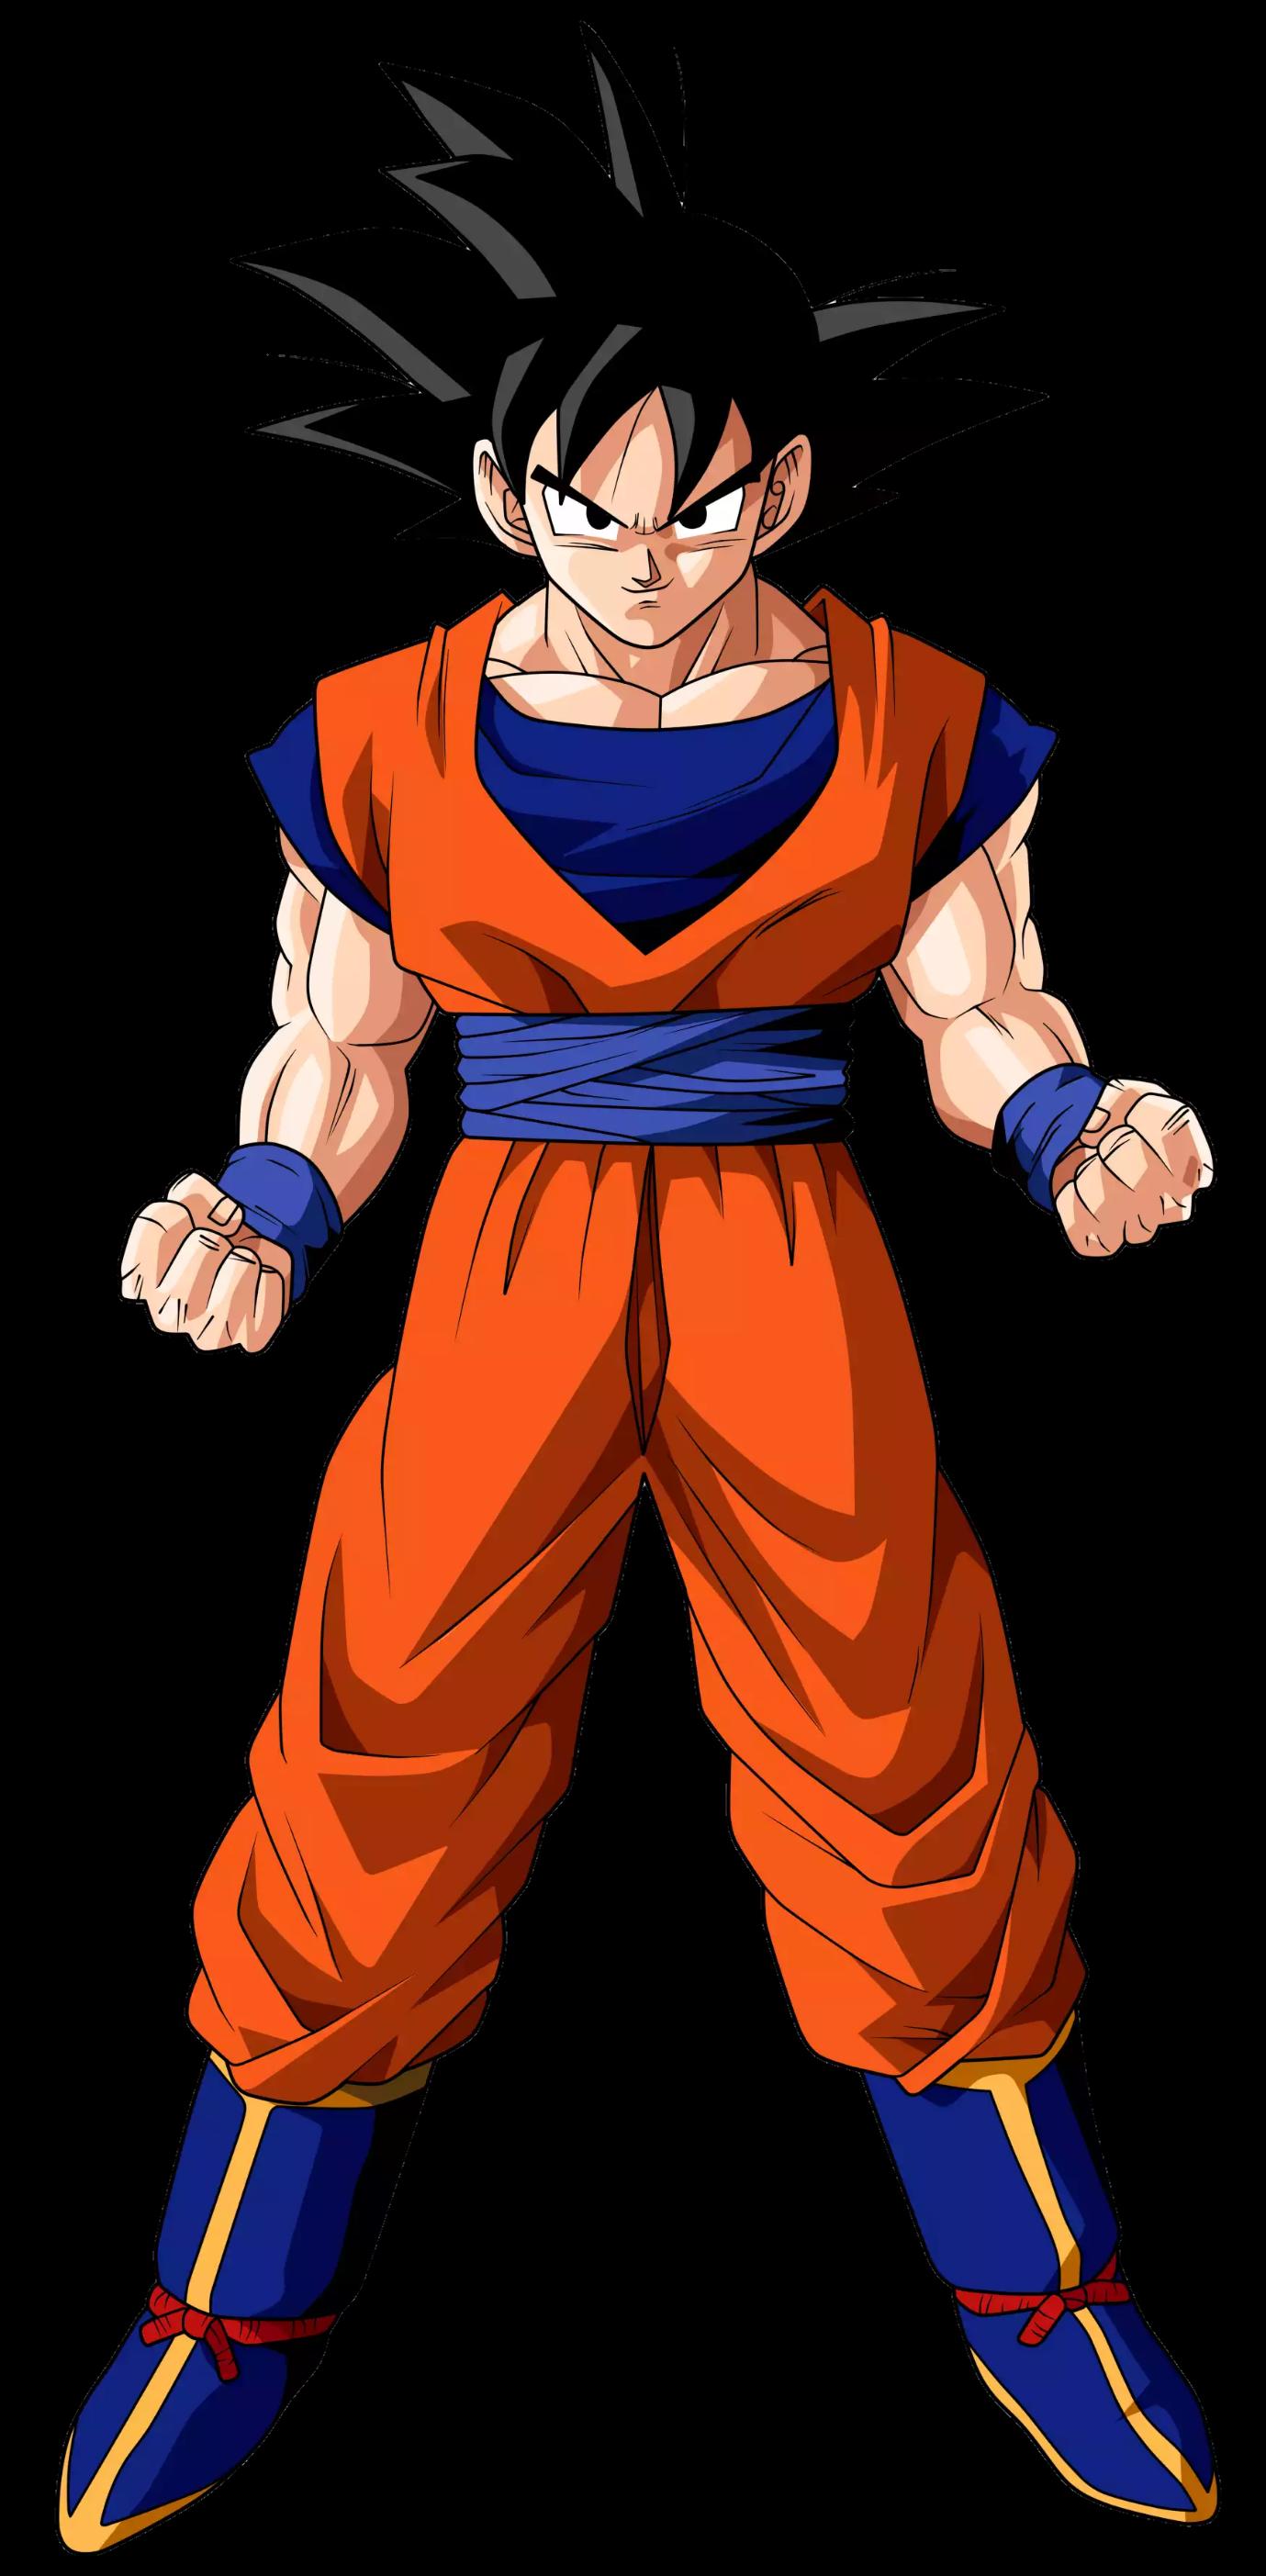 How to Become Goku